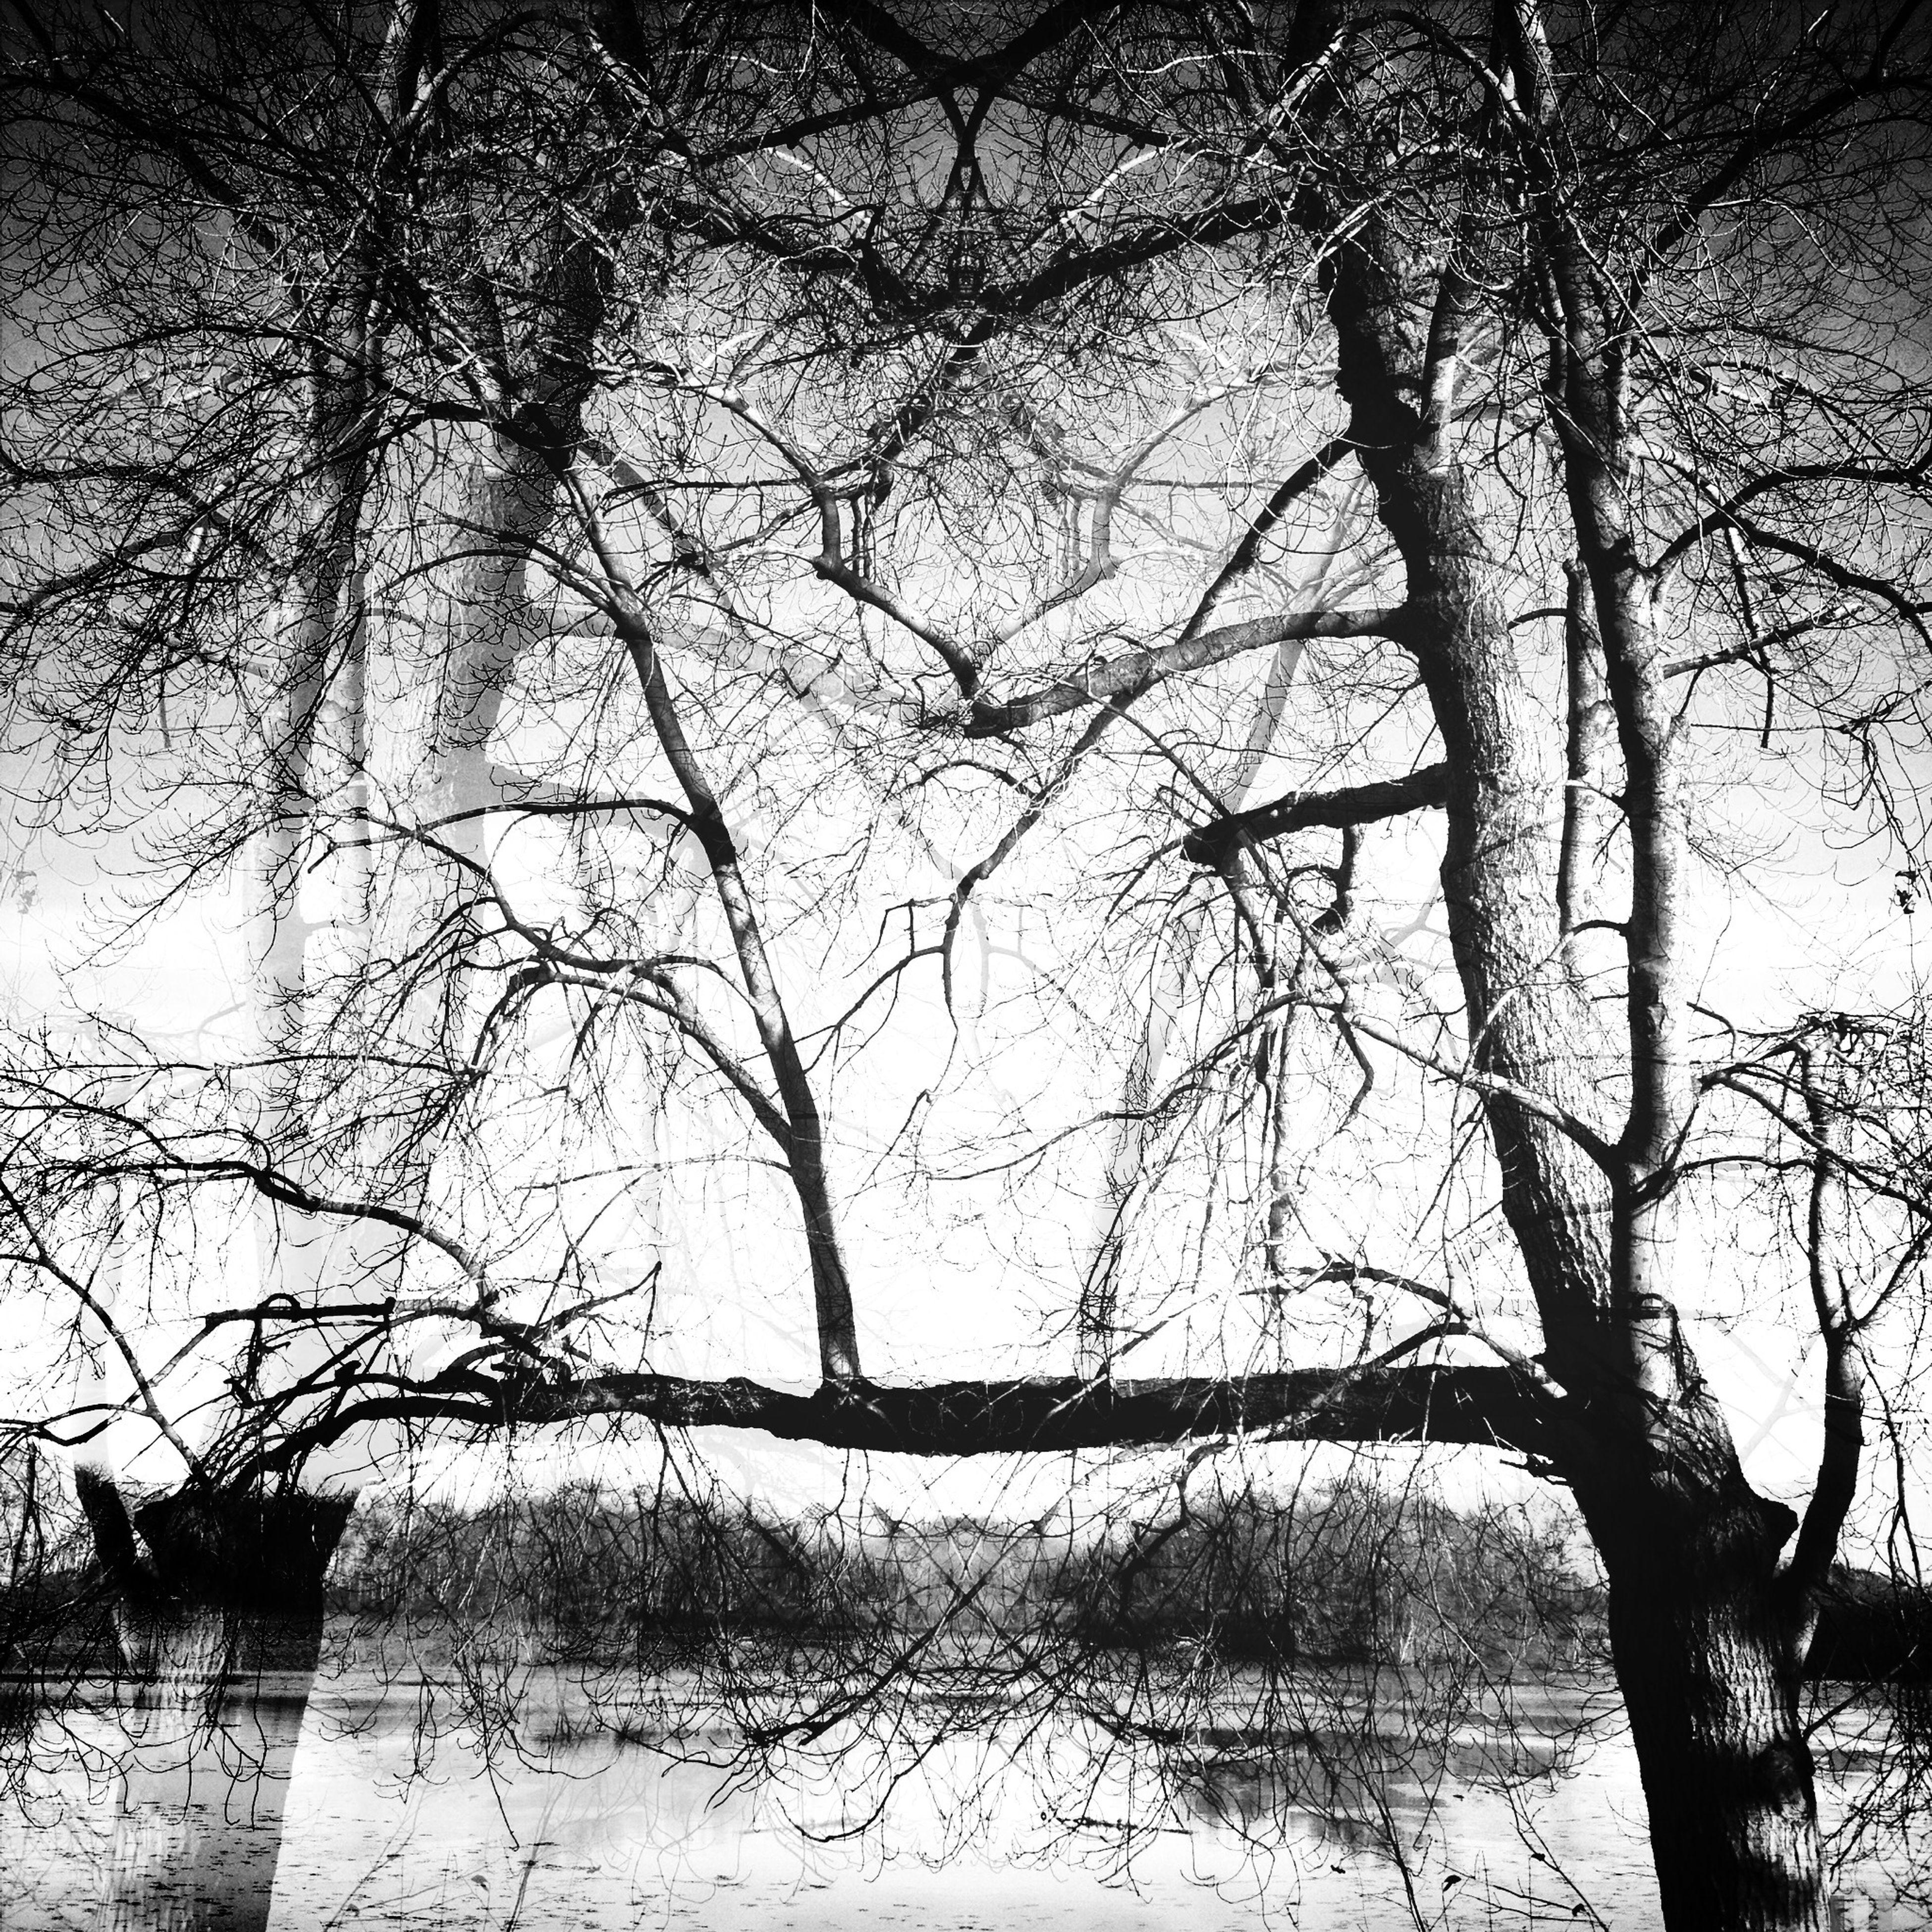 KCe HipstaEdit Sortofsymmetry Treelove